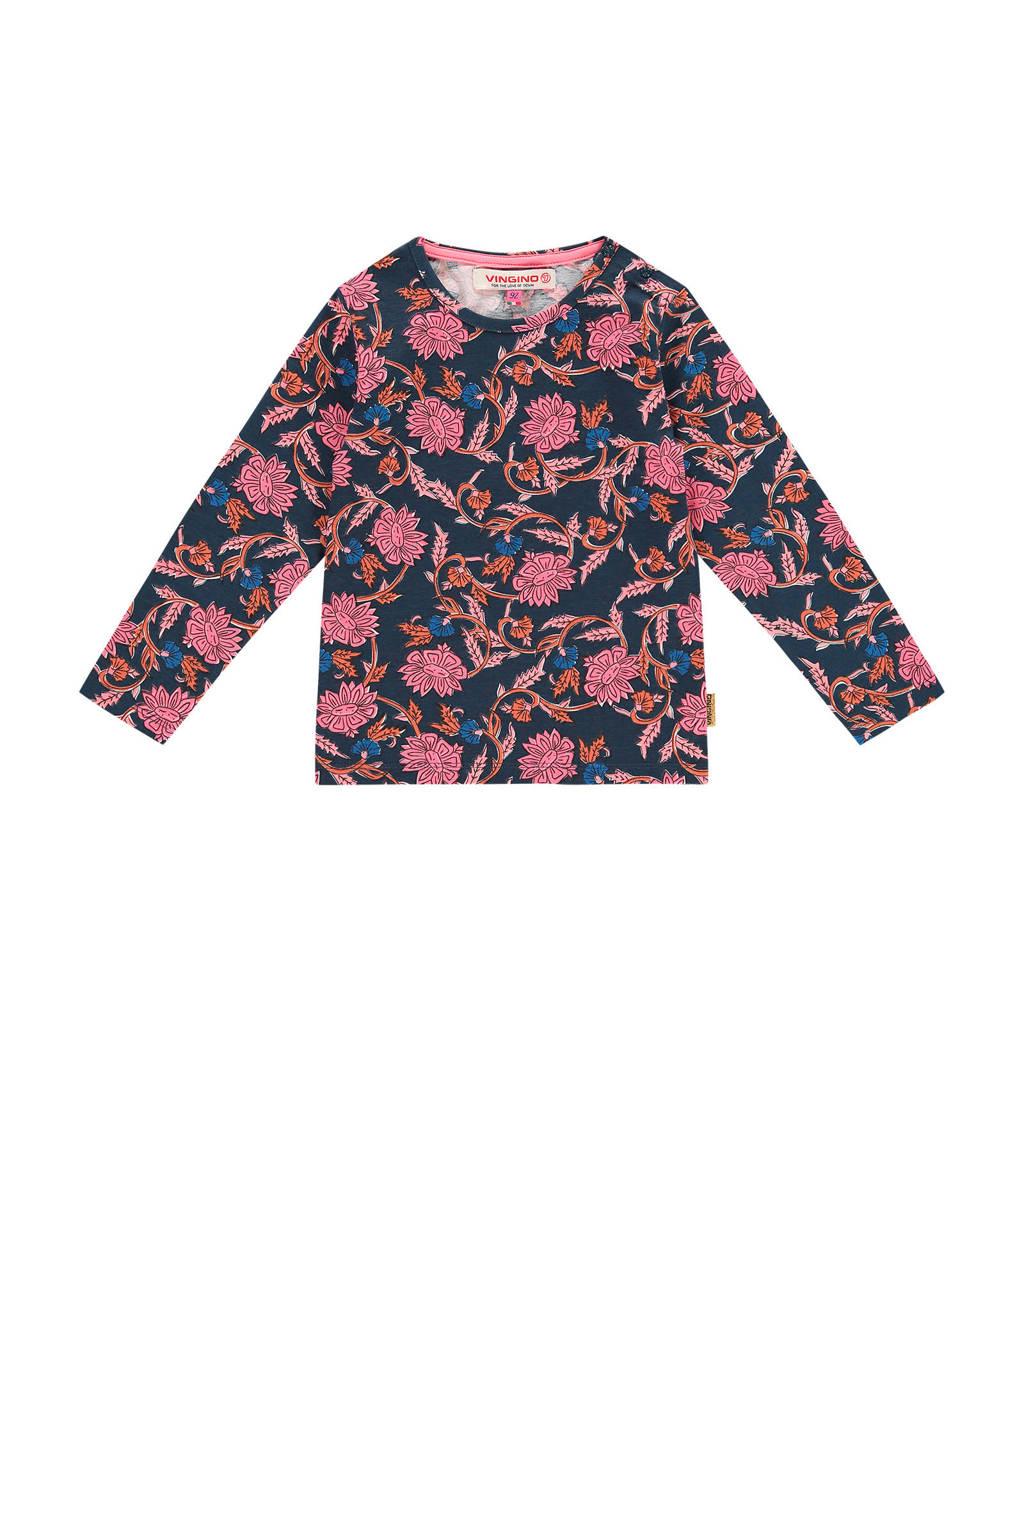 Vingino longsleeve Jeika mini met all over print donkerblauw/roze, Donkerblauw/roze